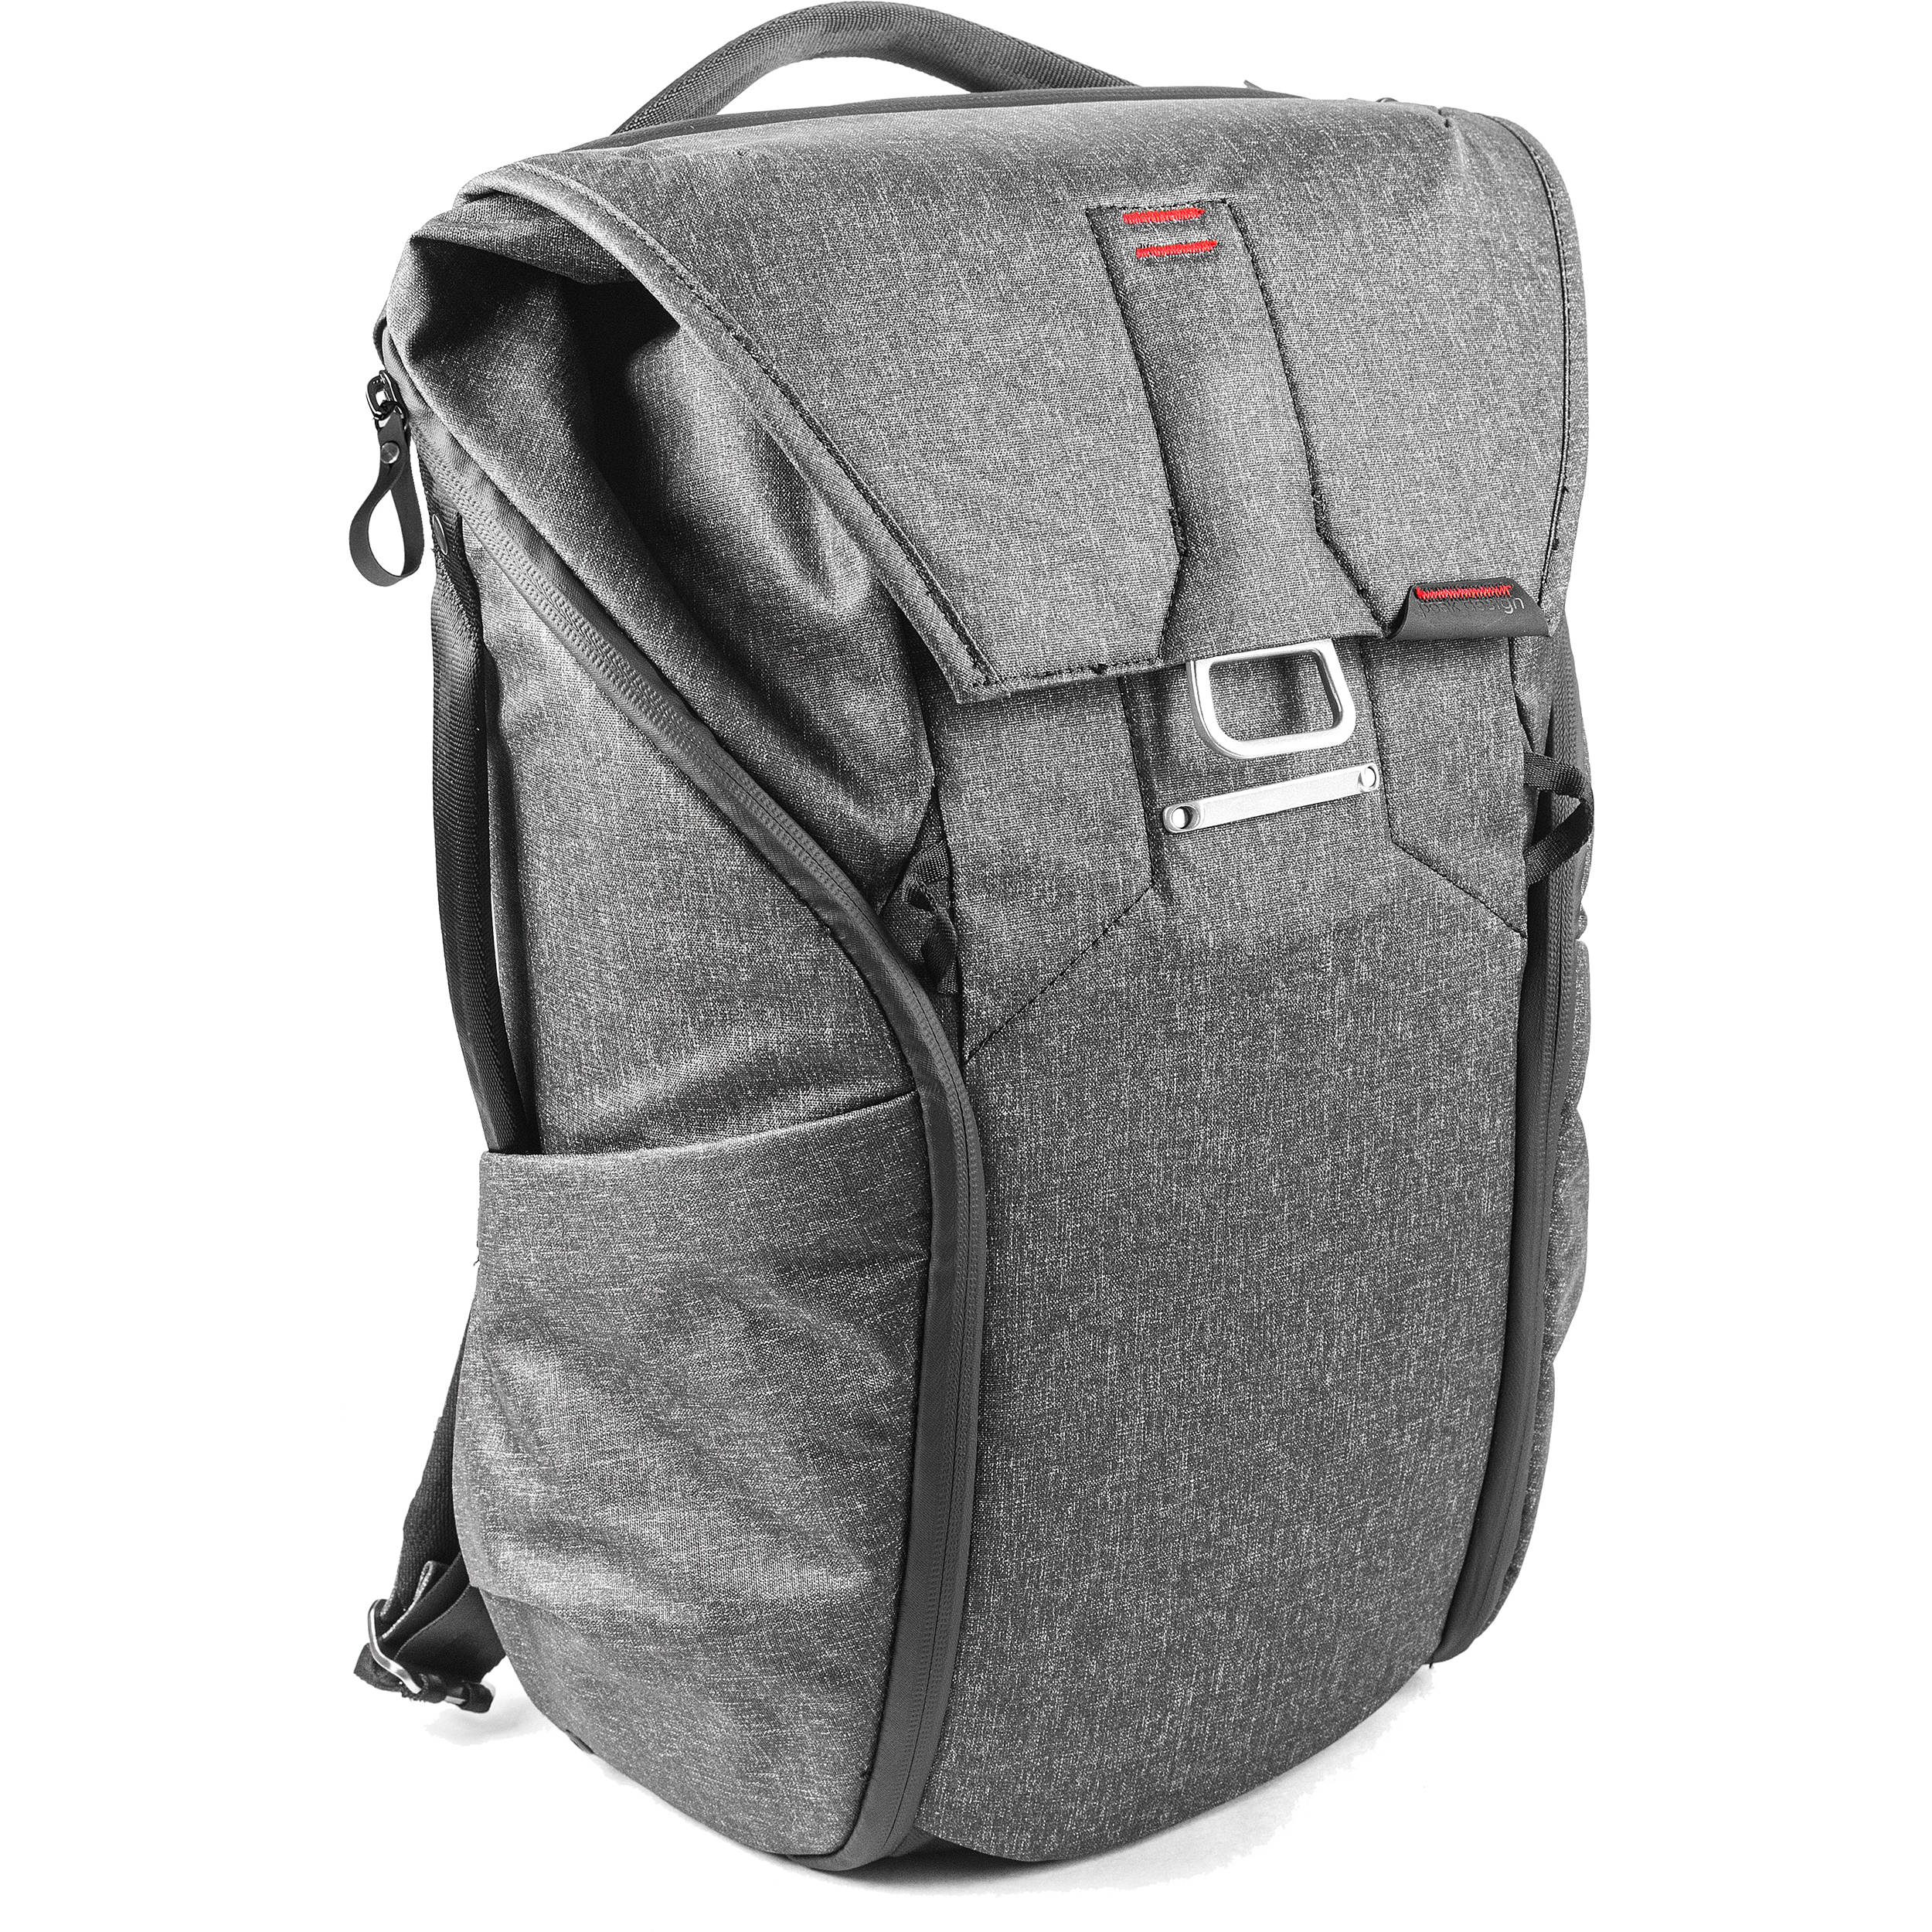 peak_design_bb_20_bl_1_everyday_backpack